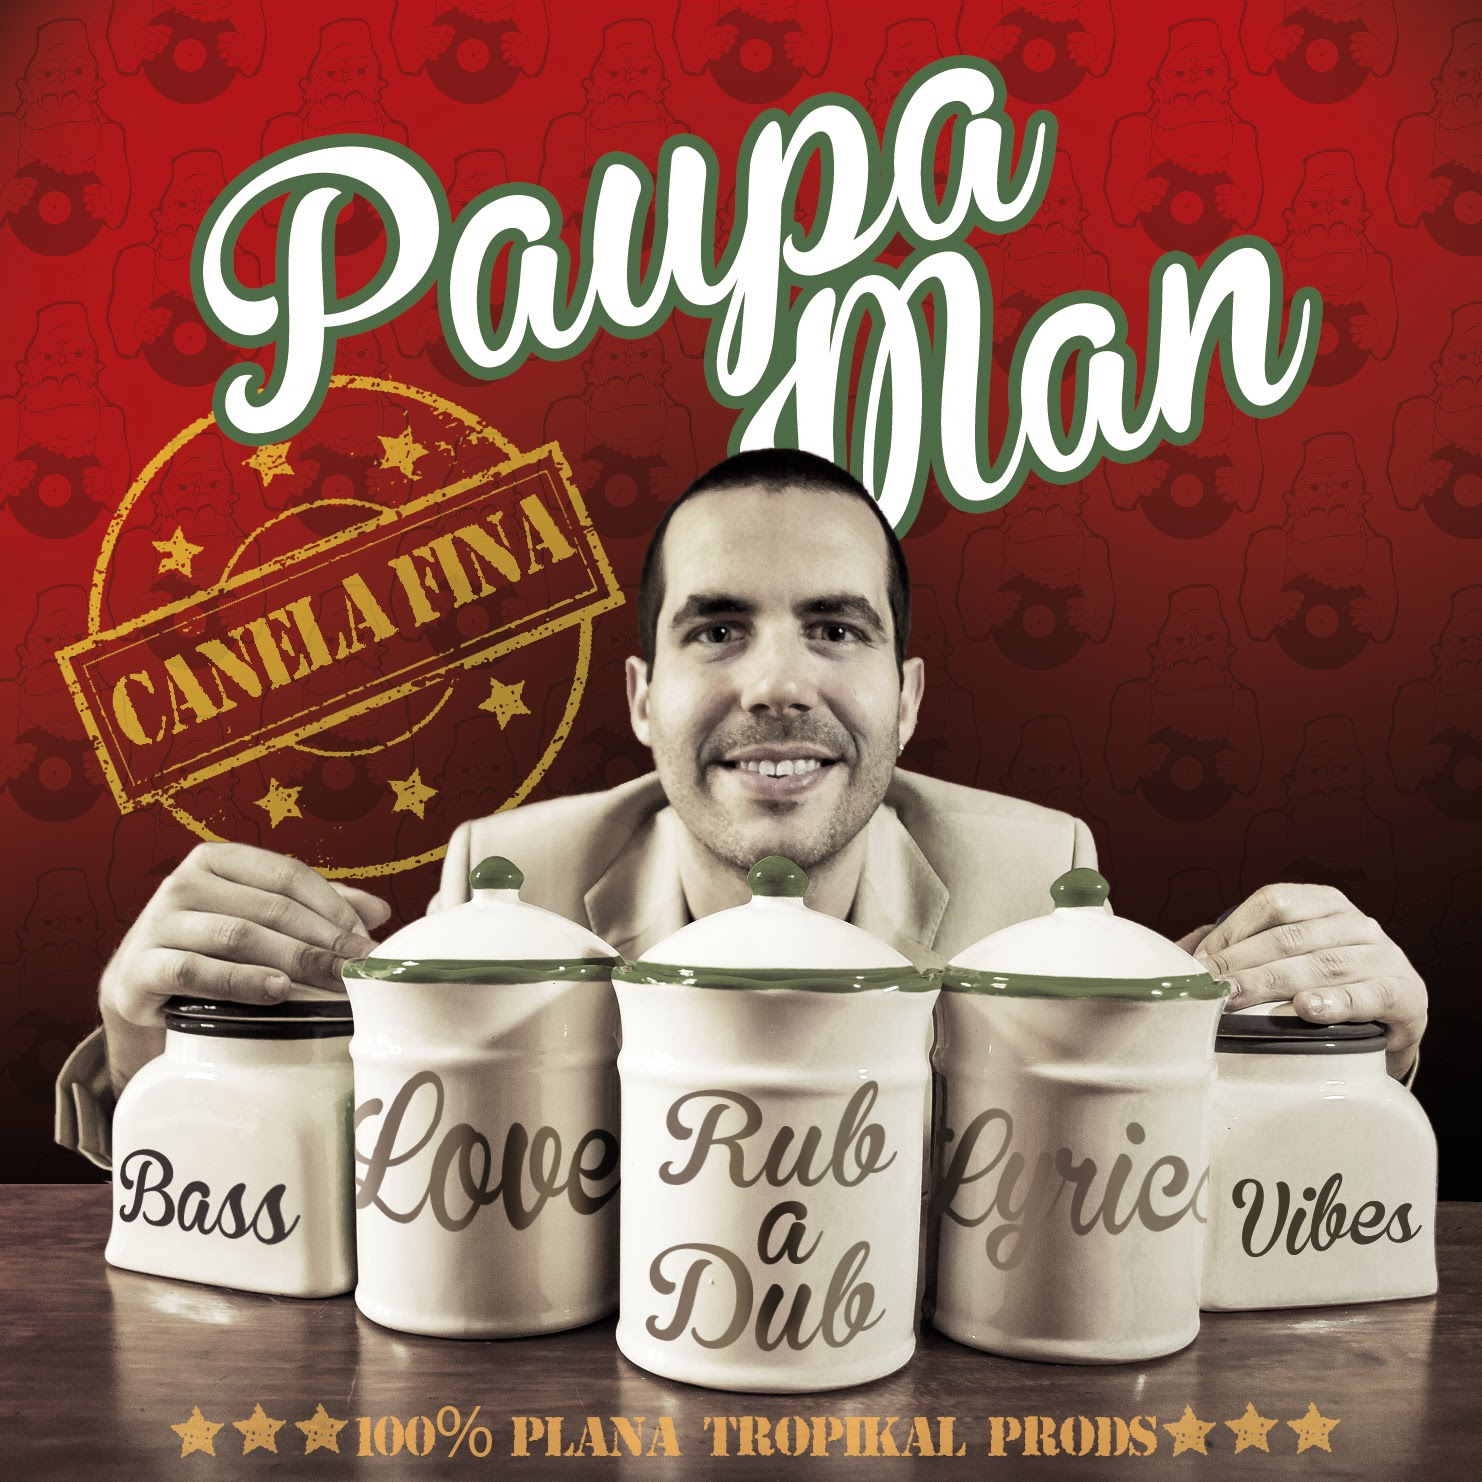 http://www.mediafire.com/download/tpfa0qzym4dglop/Paupa+Man+-+Canela+Fina.rar